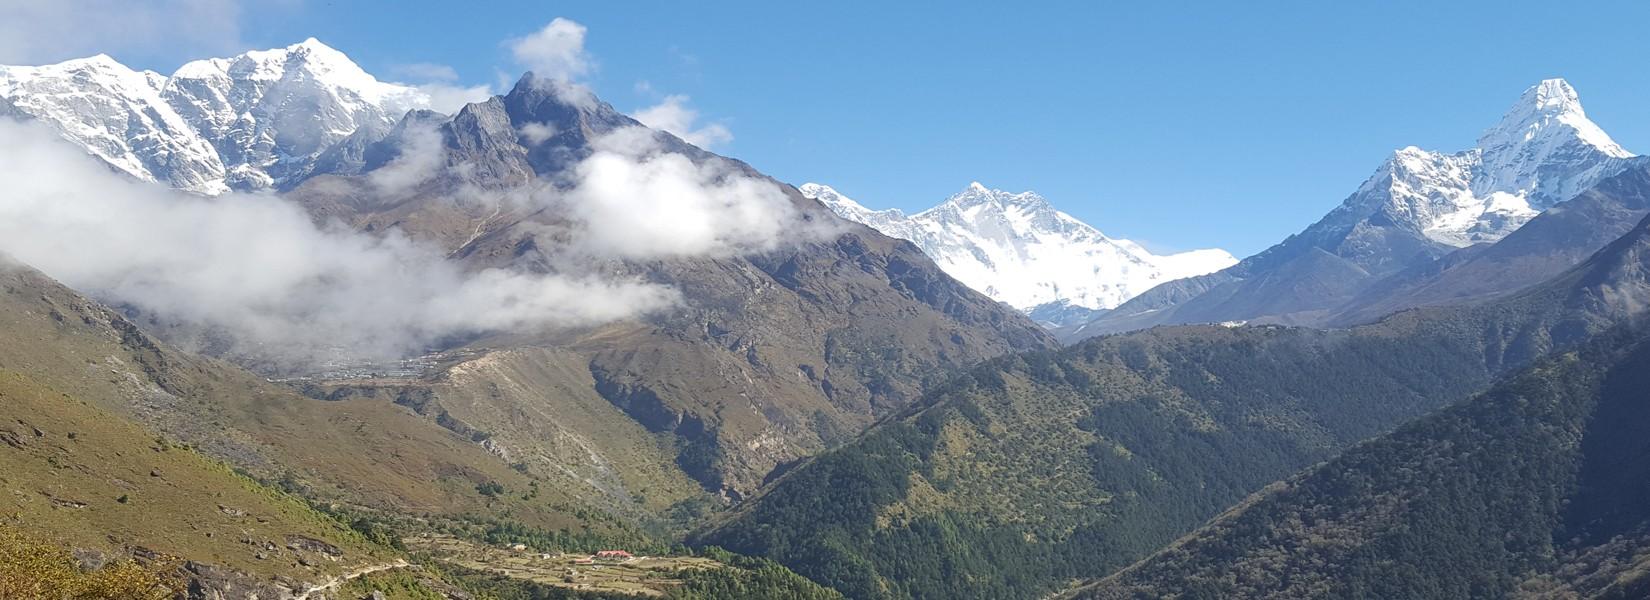 Trekking Season in Nepal Banner Image